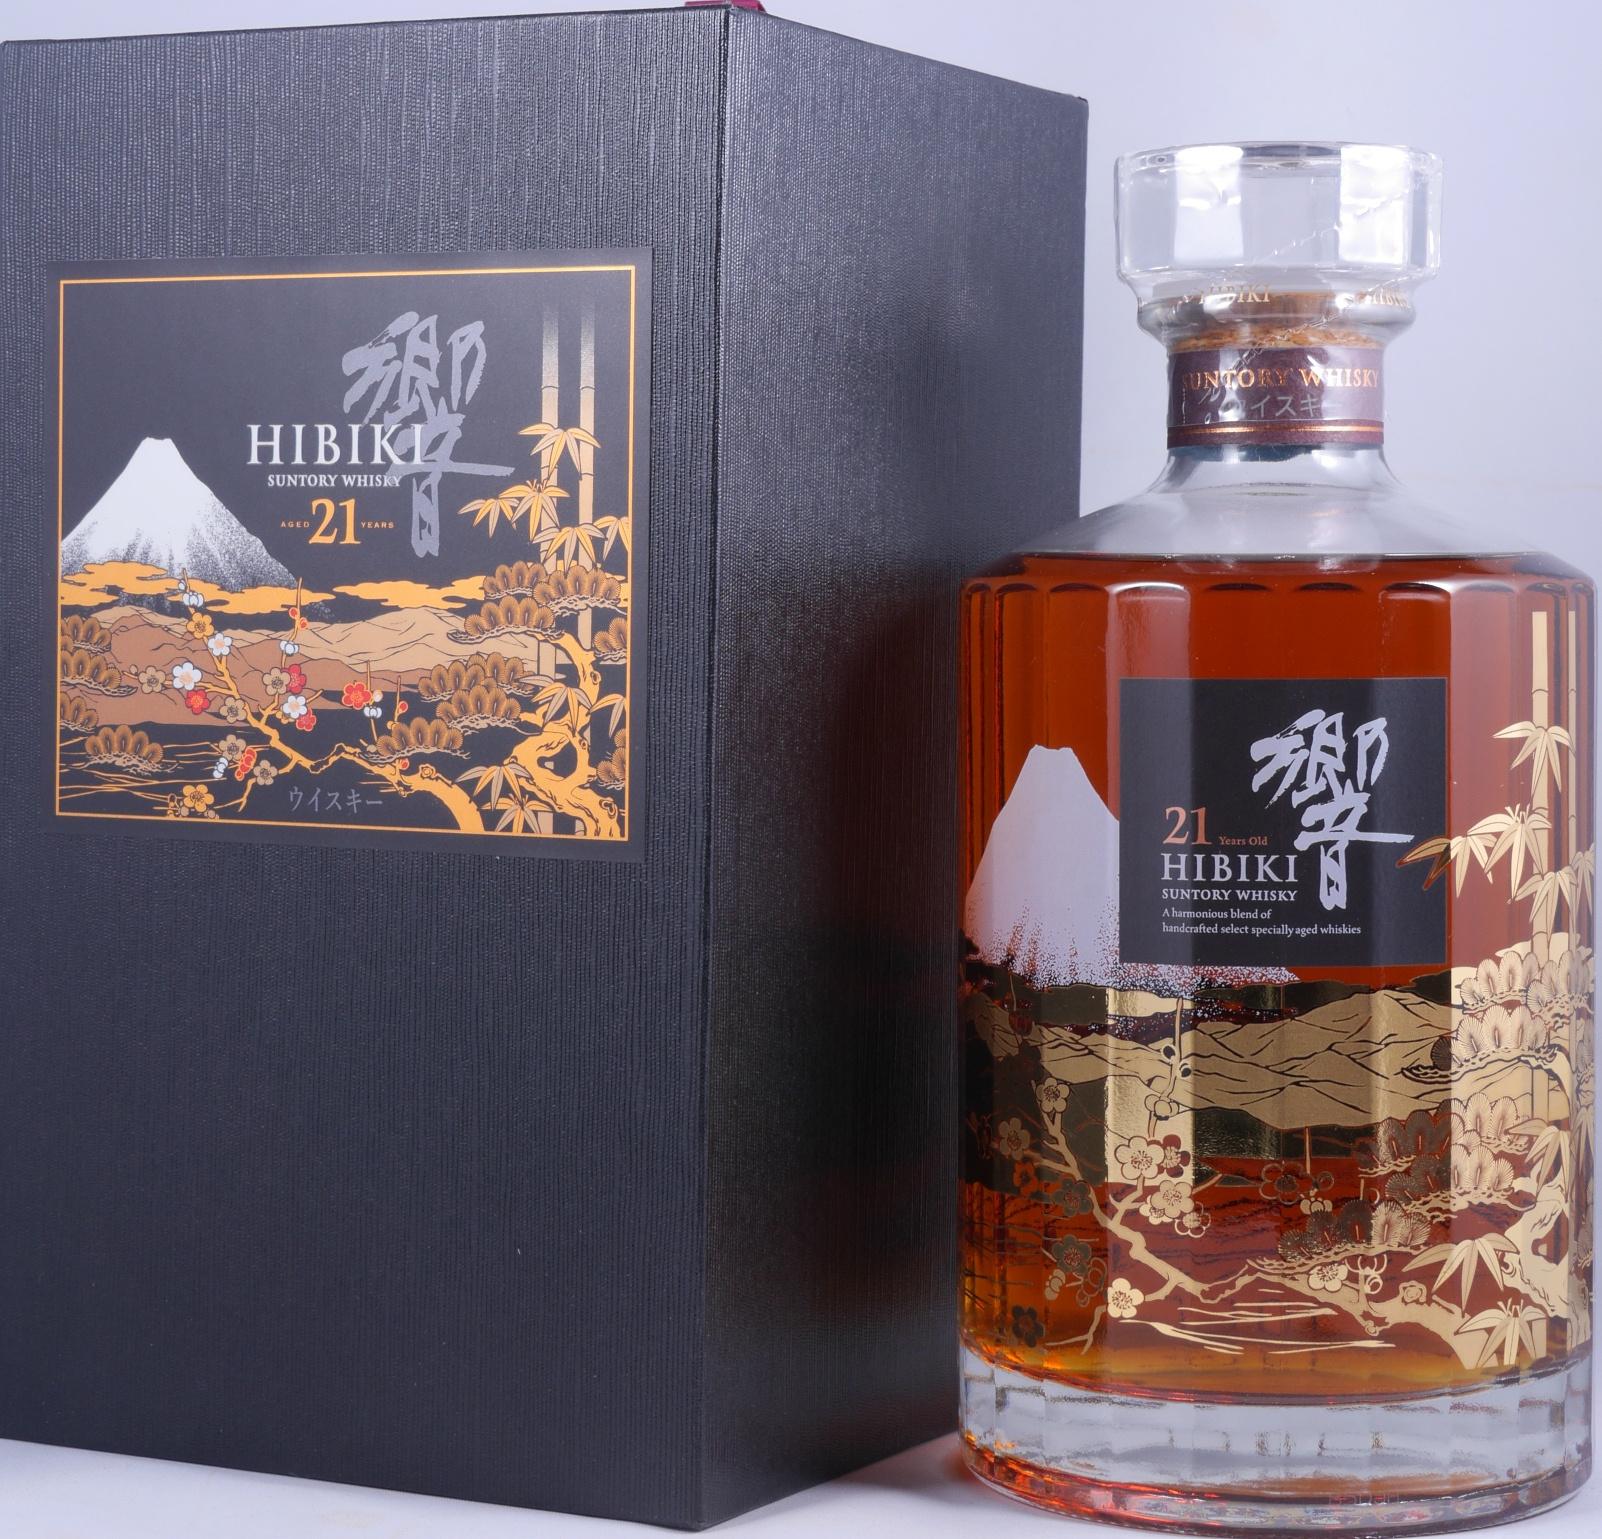 hibiki harmony limited edition 2018 for sale